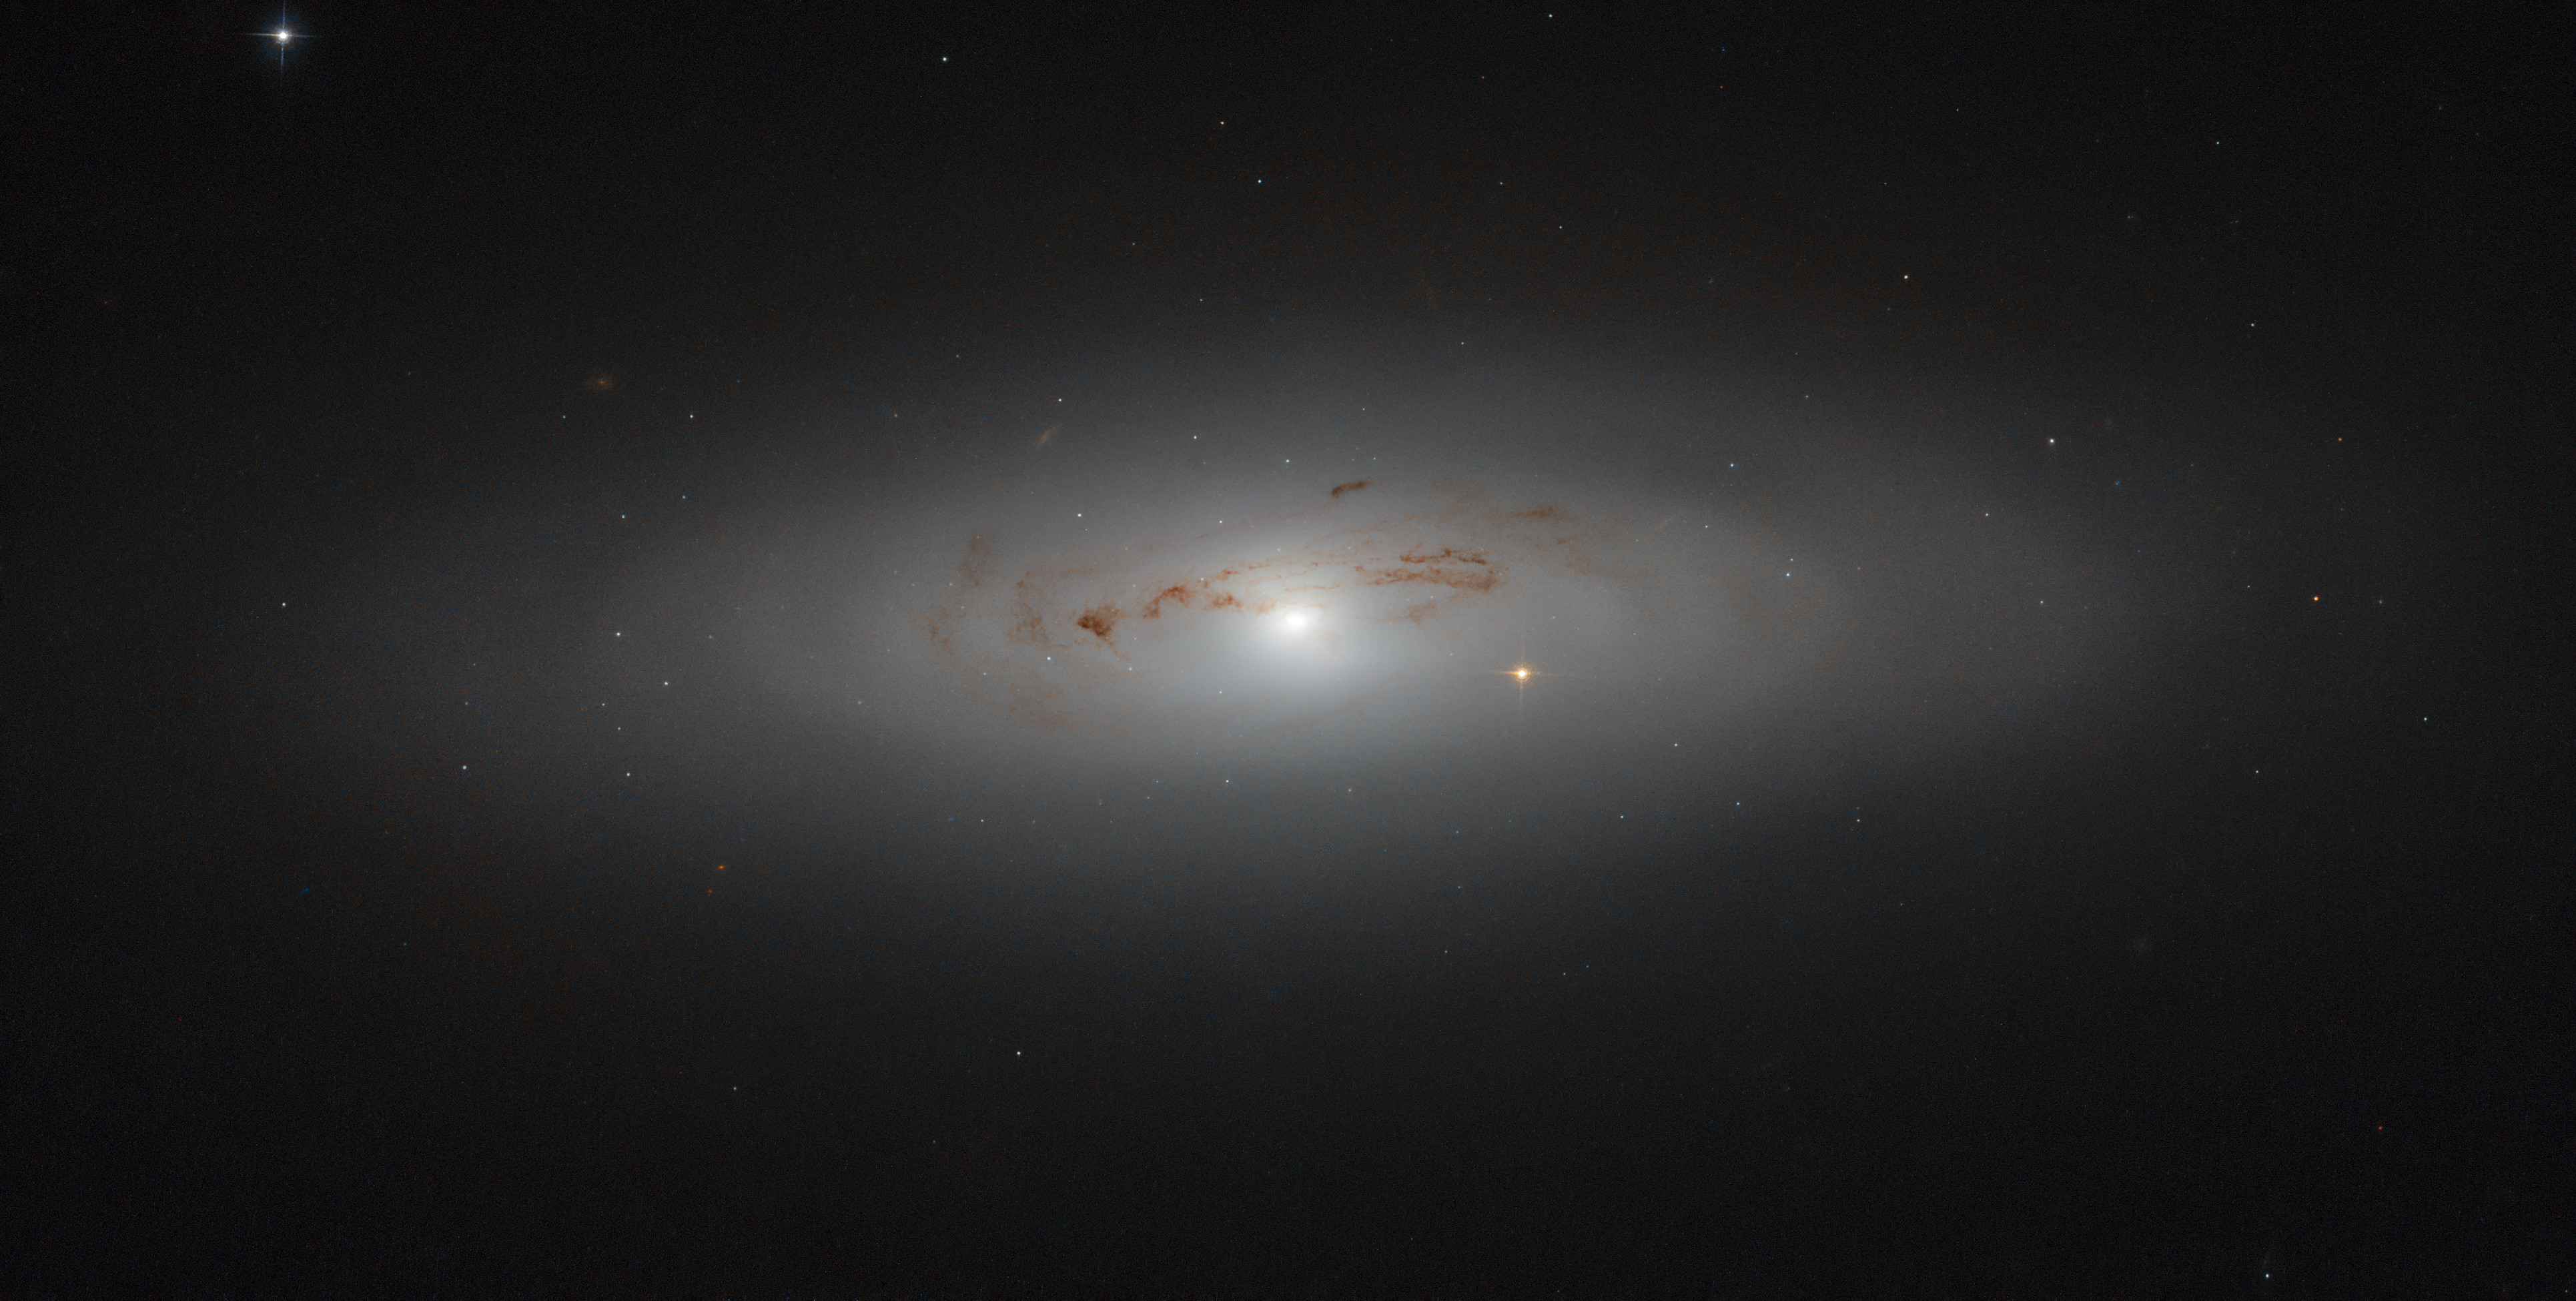 NGC4036 lenticular galaxy